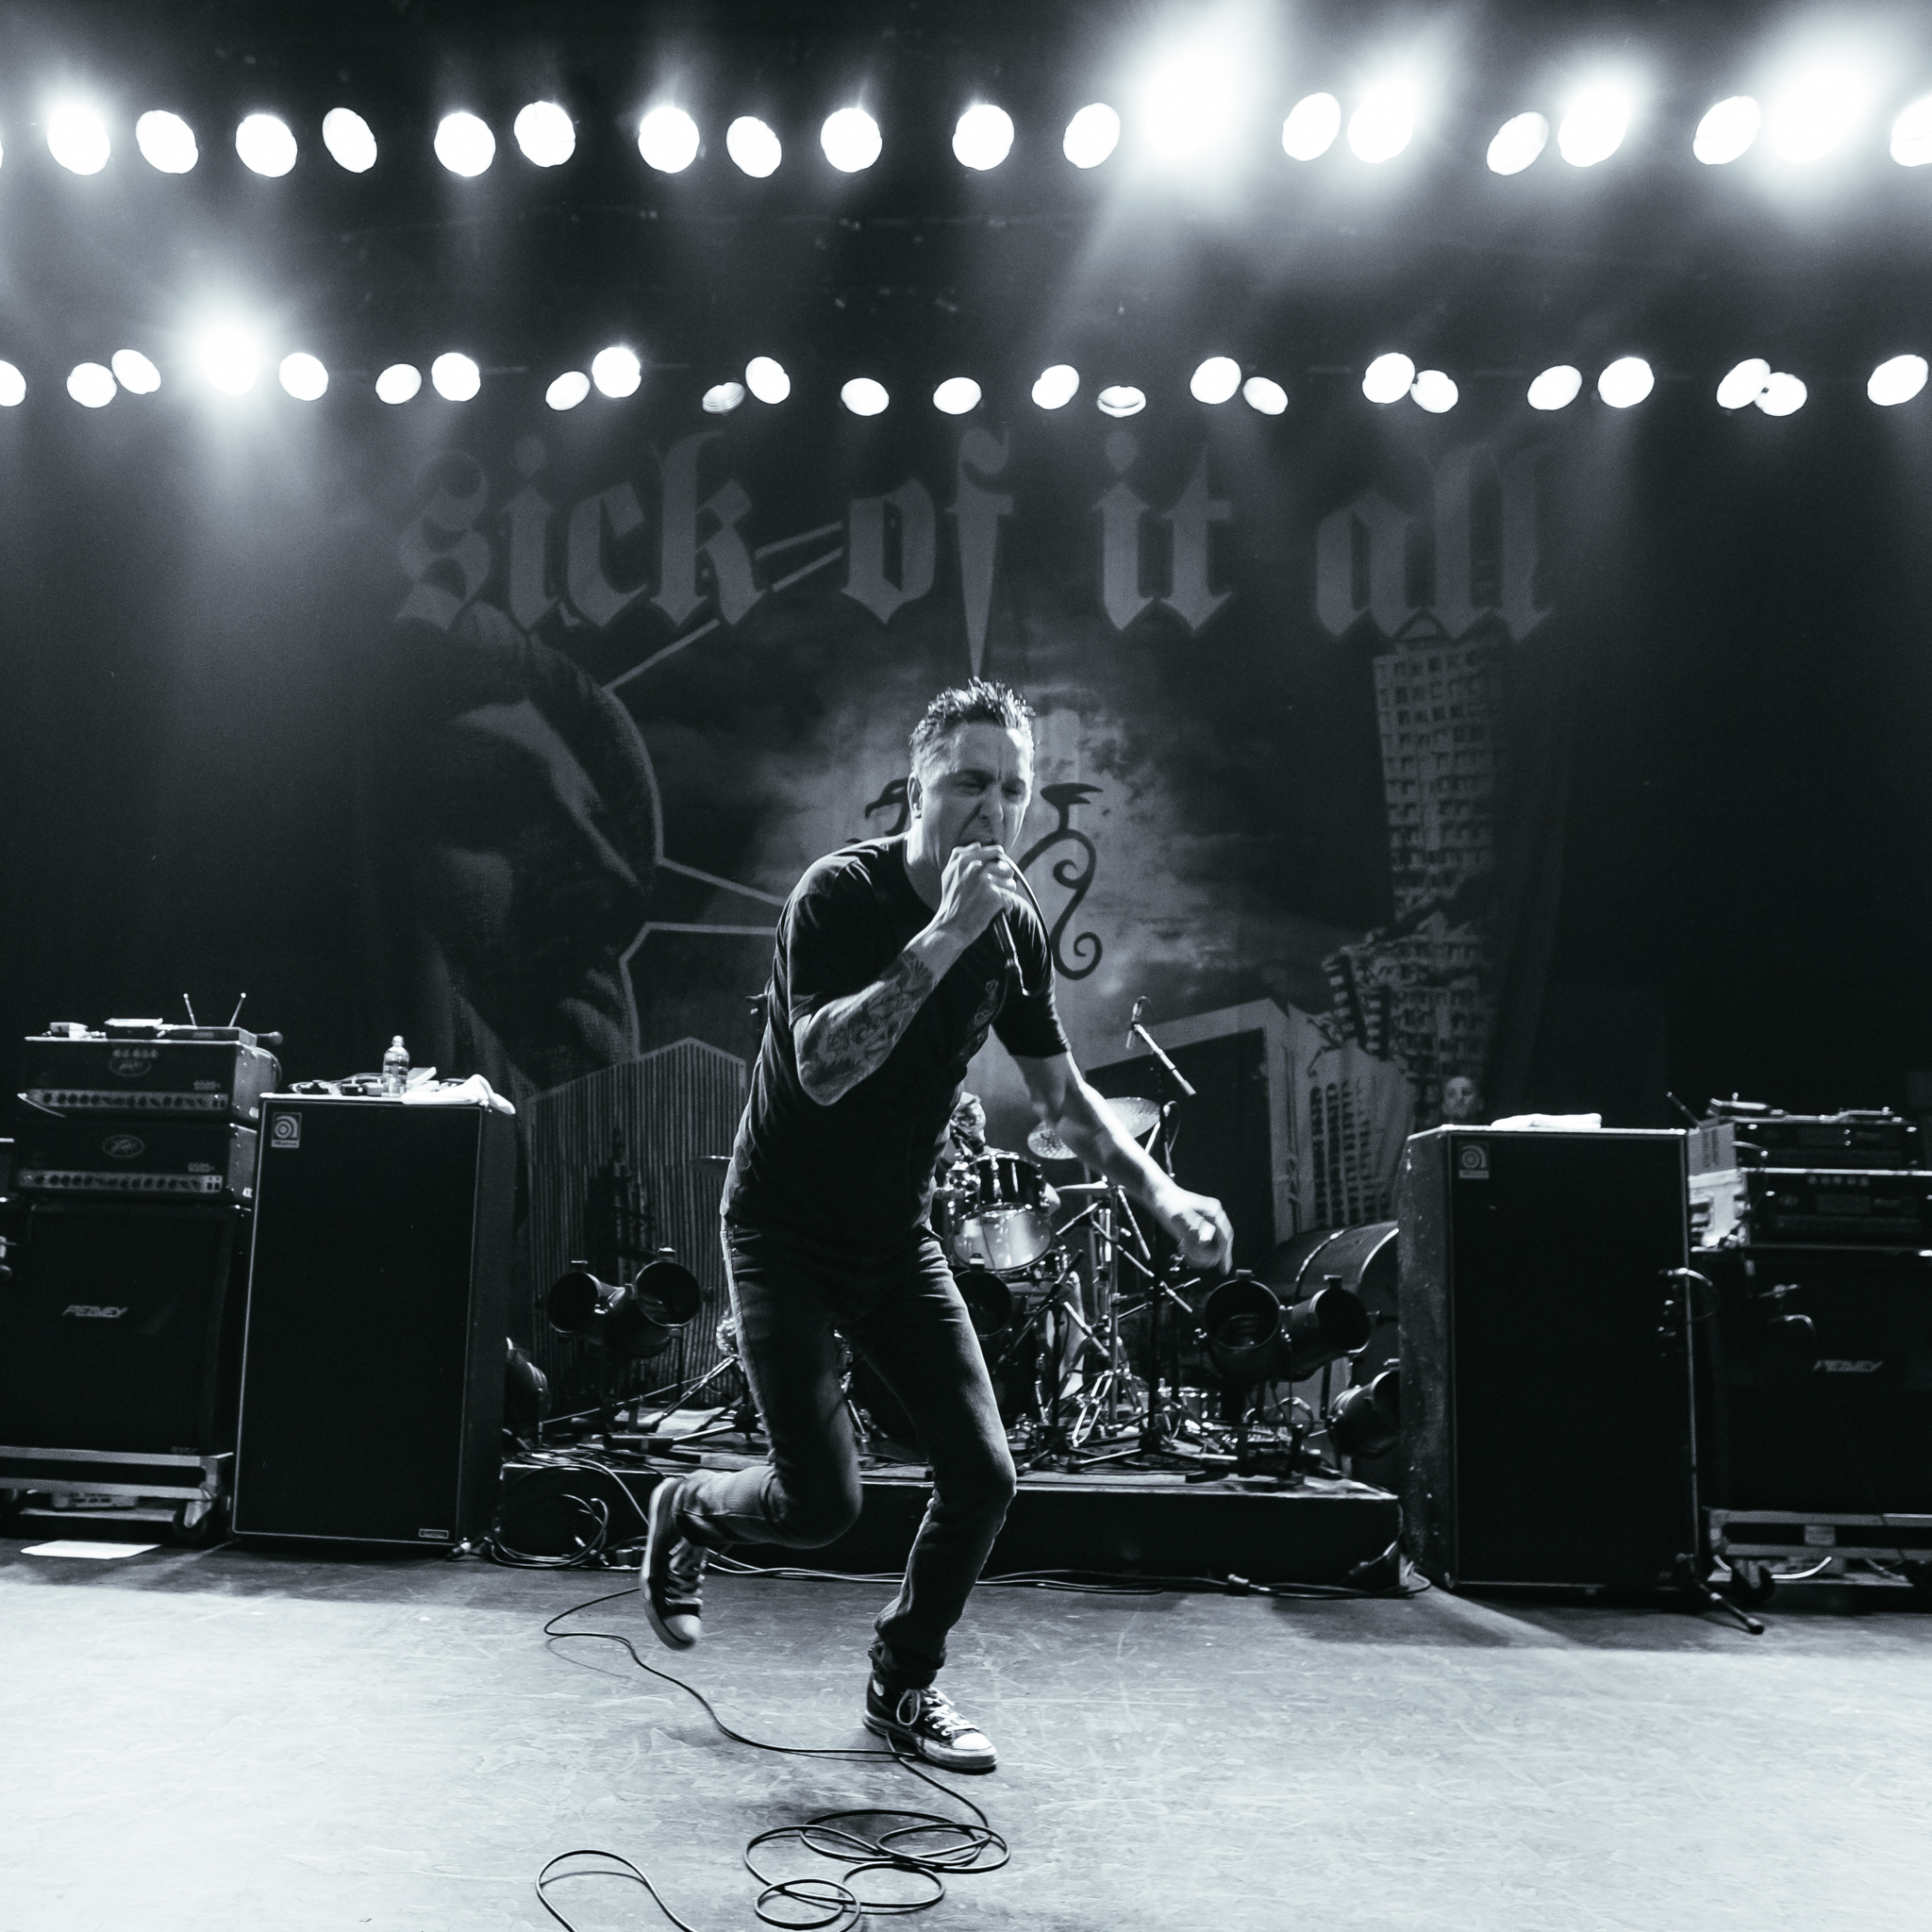 Mitch Lowe Photo - Refused & Sick Of It All - The Tivoli-46.jpg